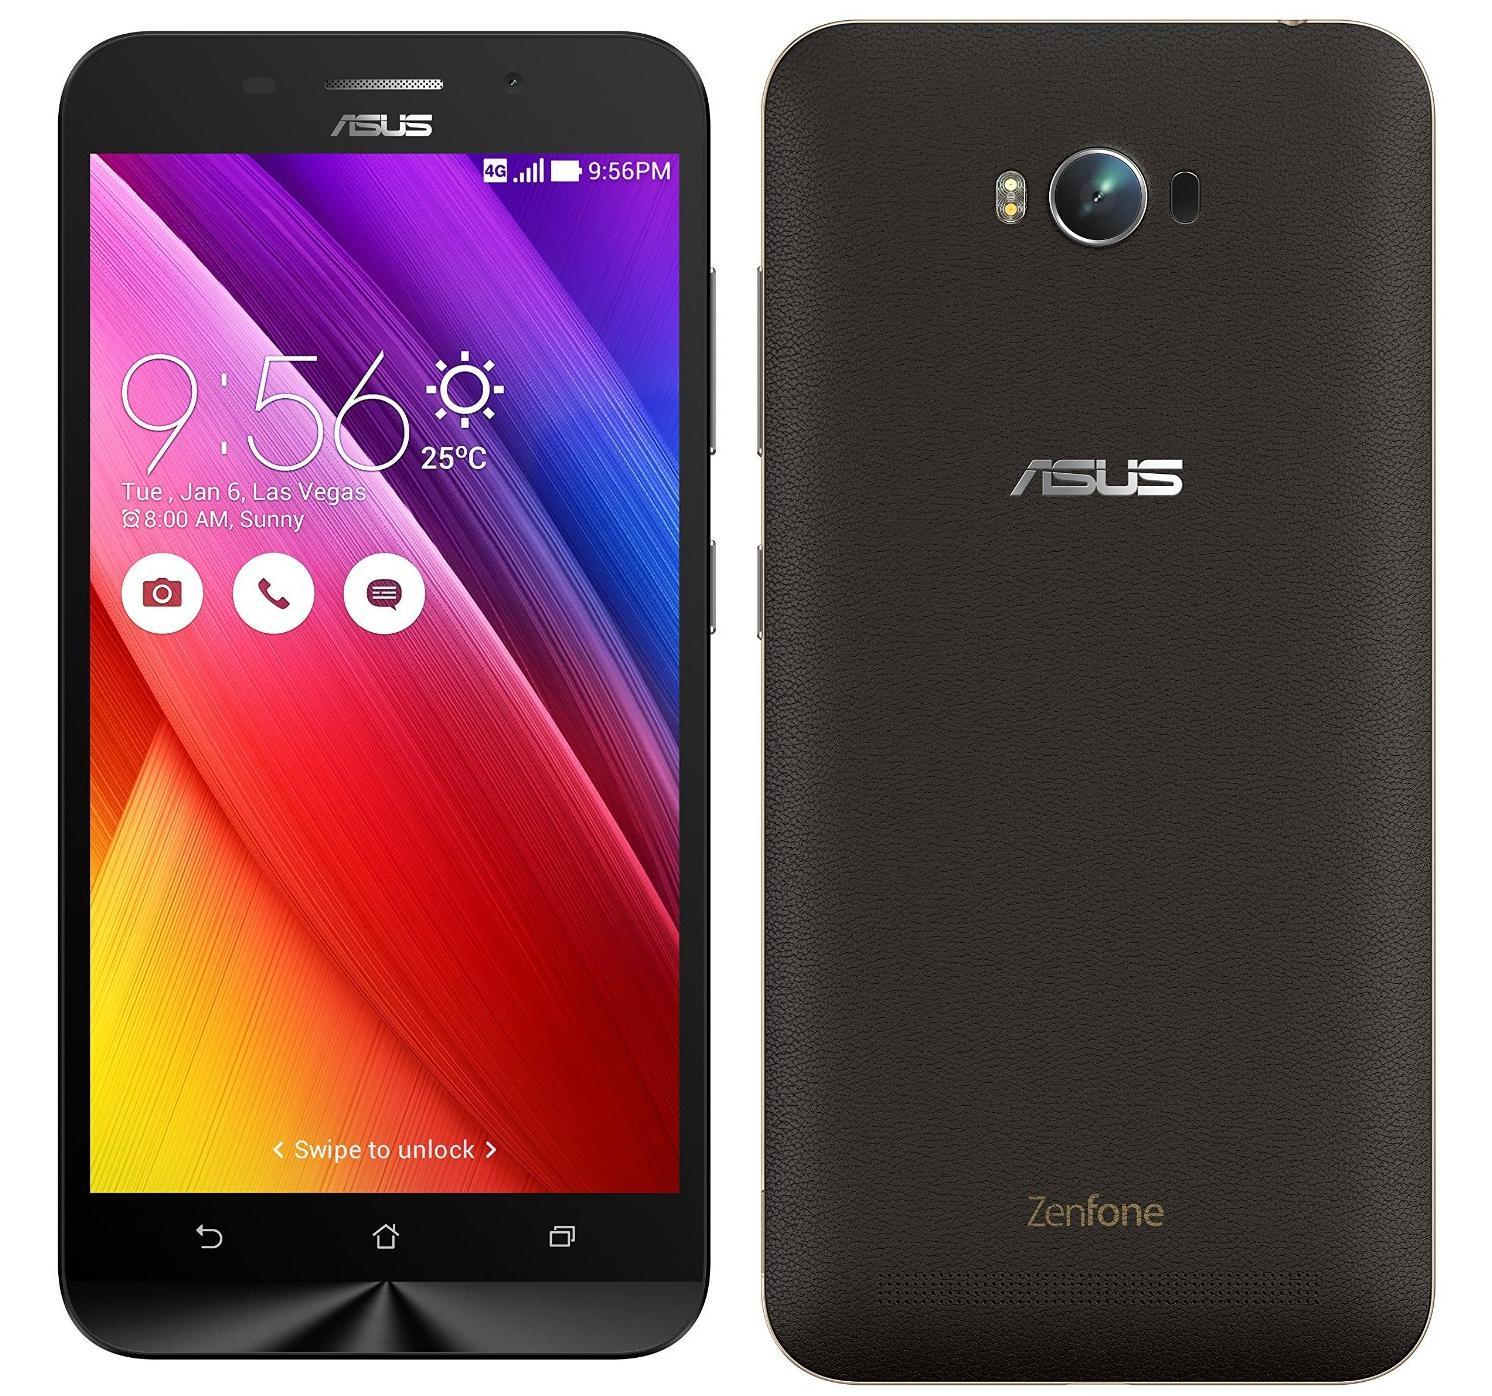 "Smartphone 5.5"" Asus Zenfone MAX ZC550KL - IPS 1280x720, Snapdragon 410 1.2GHz, RAM 2Go, 16Go, 5000mAh, Dual Sim, Android 5.0"